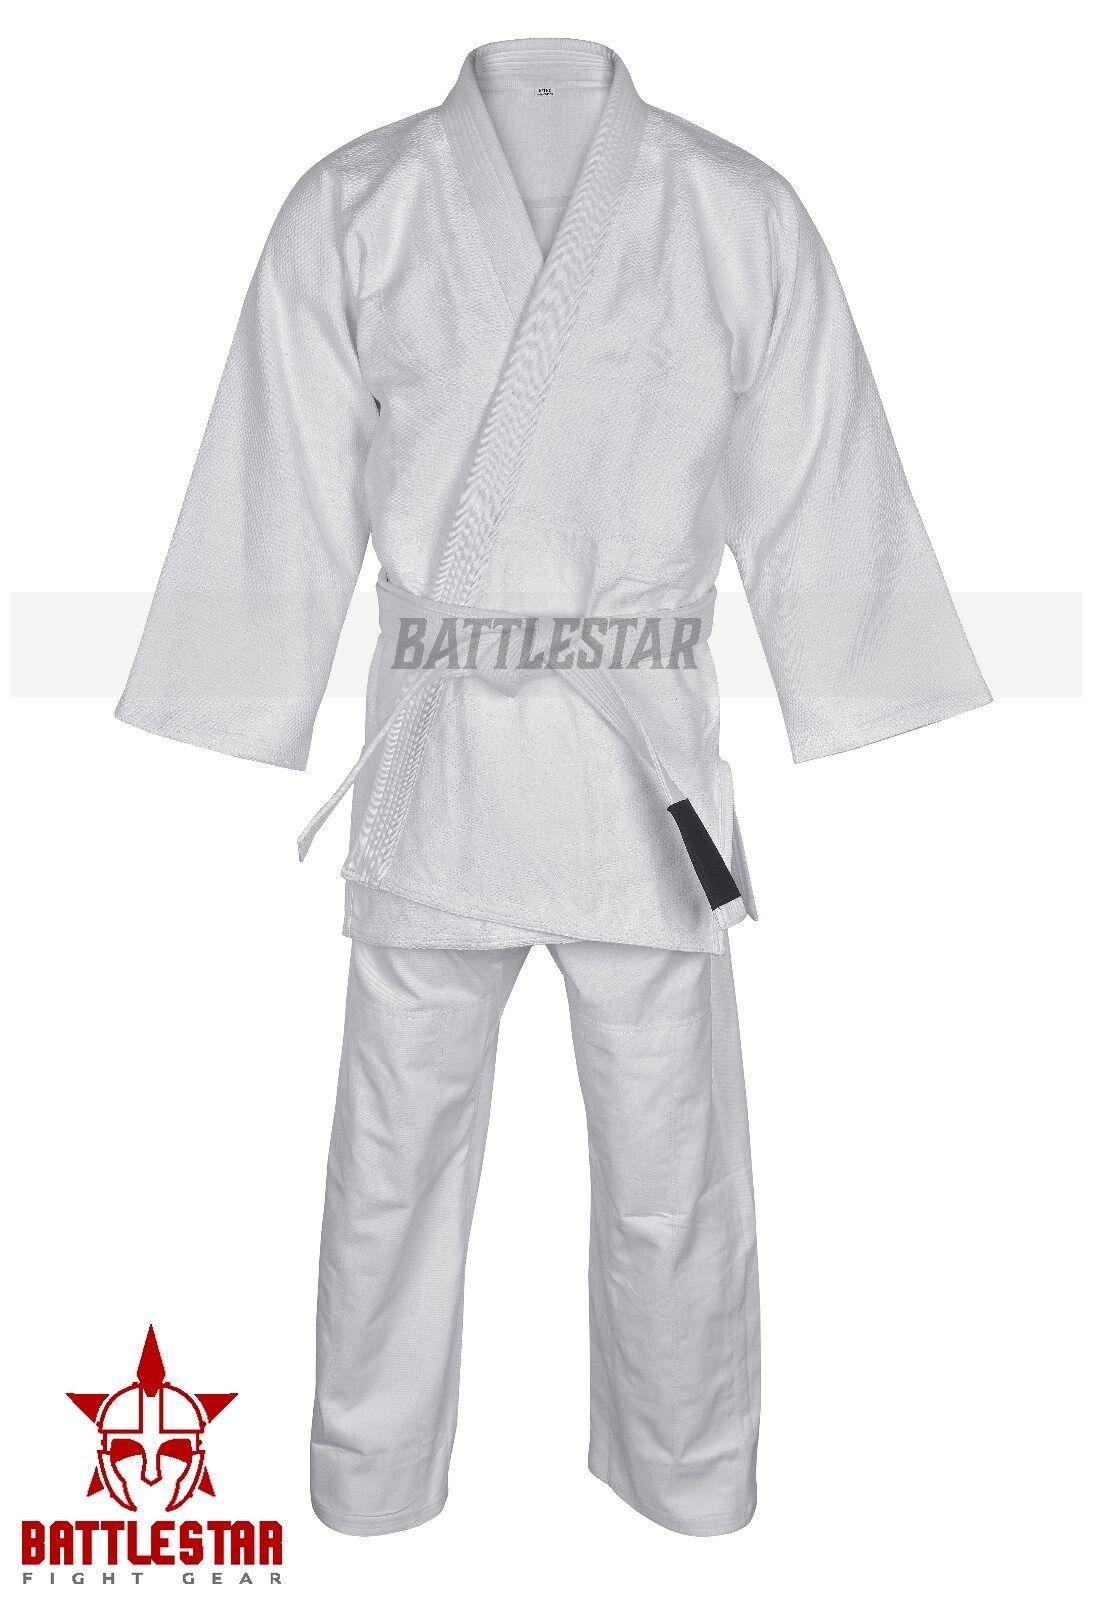 JUDO CONTEST Uniform  SUIT,Heavy duty double Weave 550 GSM WHITE ADIDAS STYLE Gi